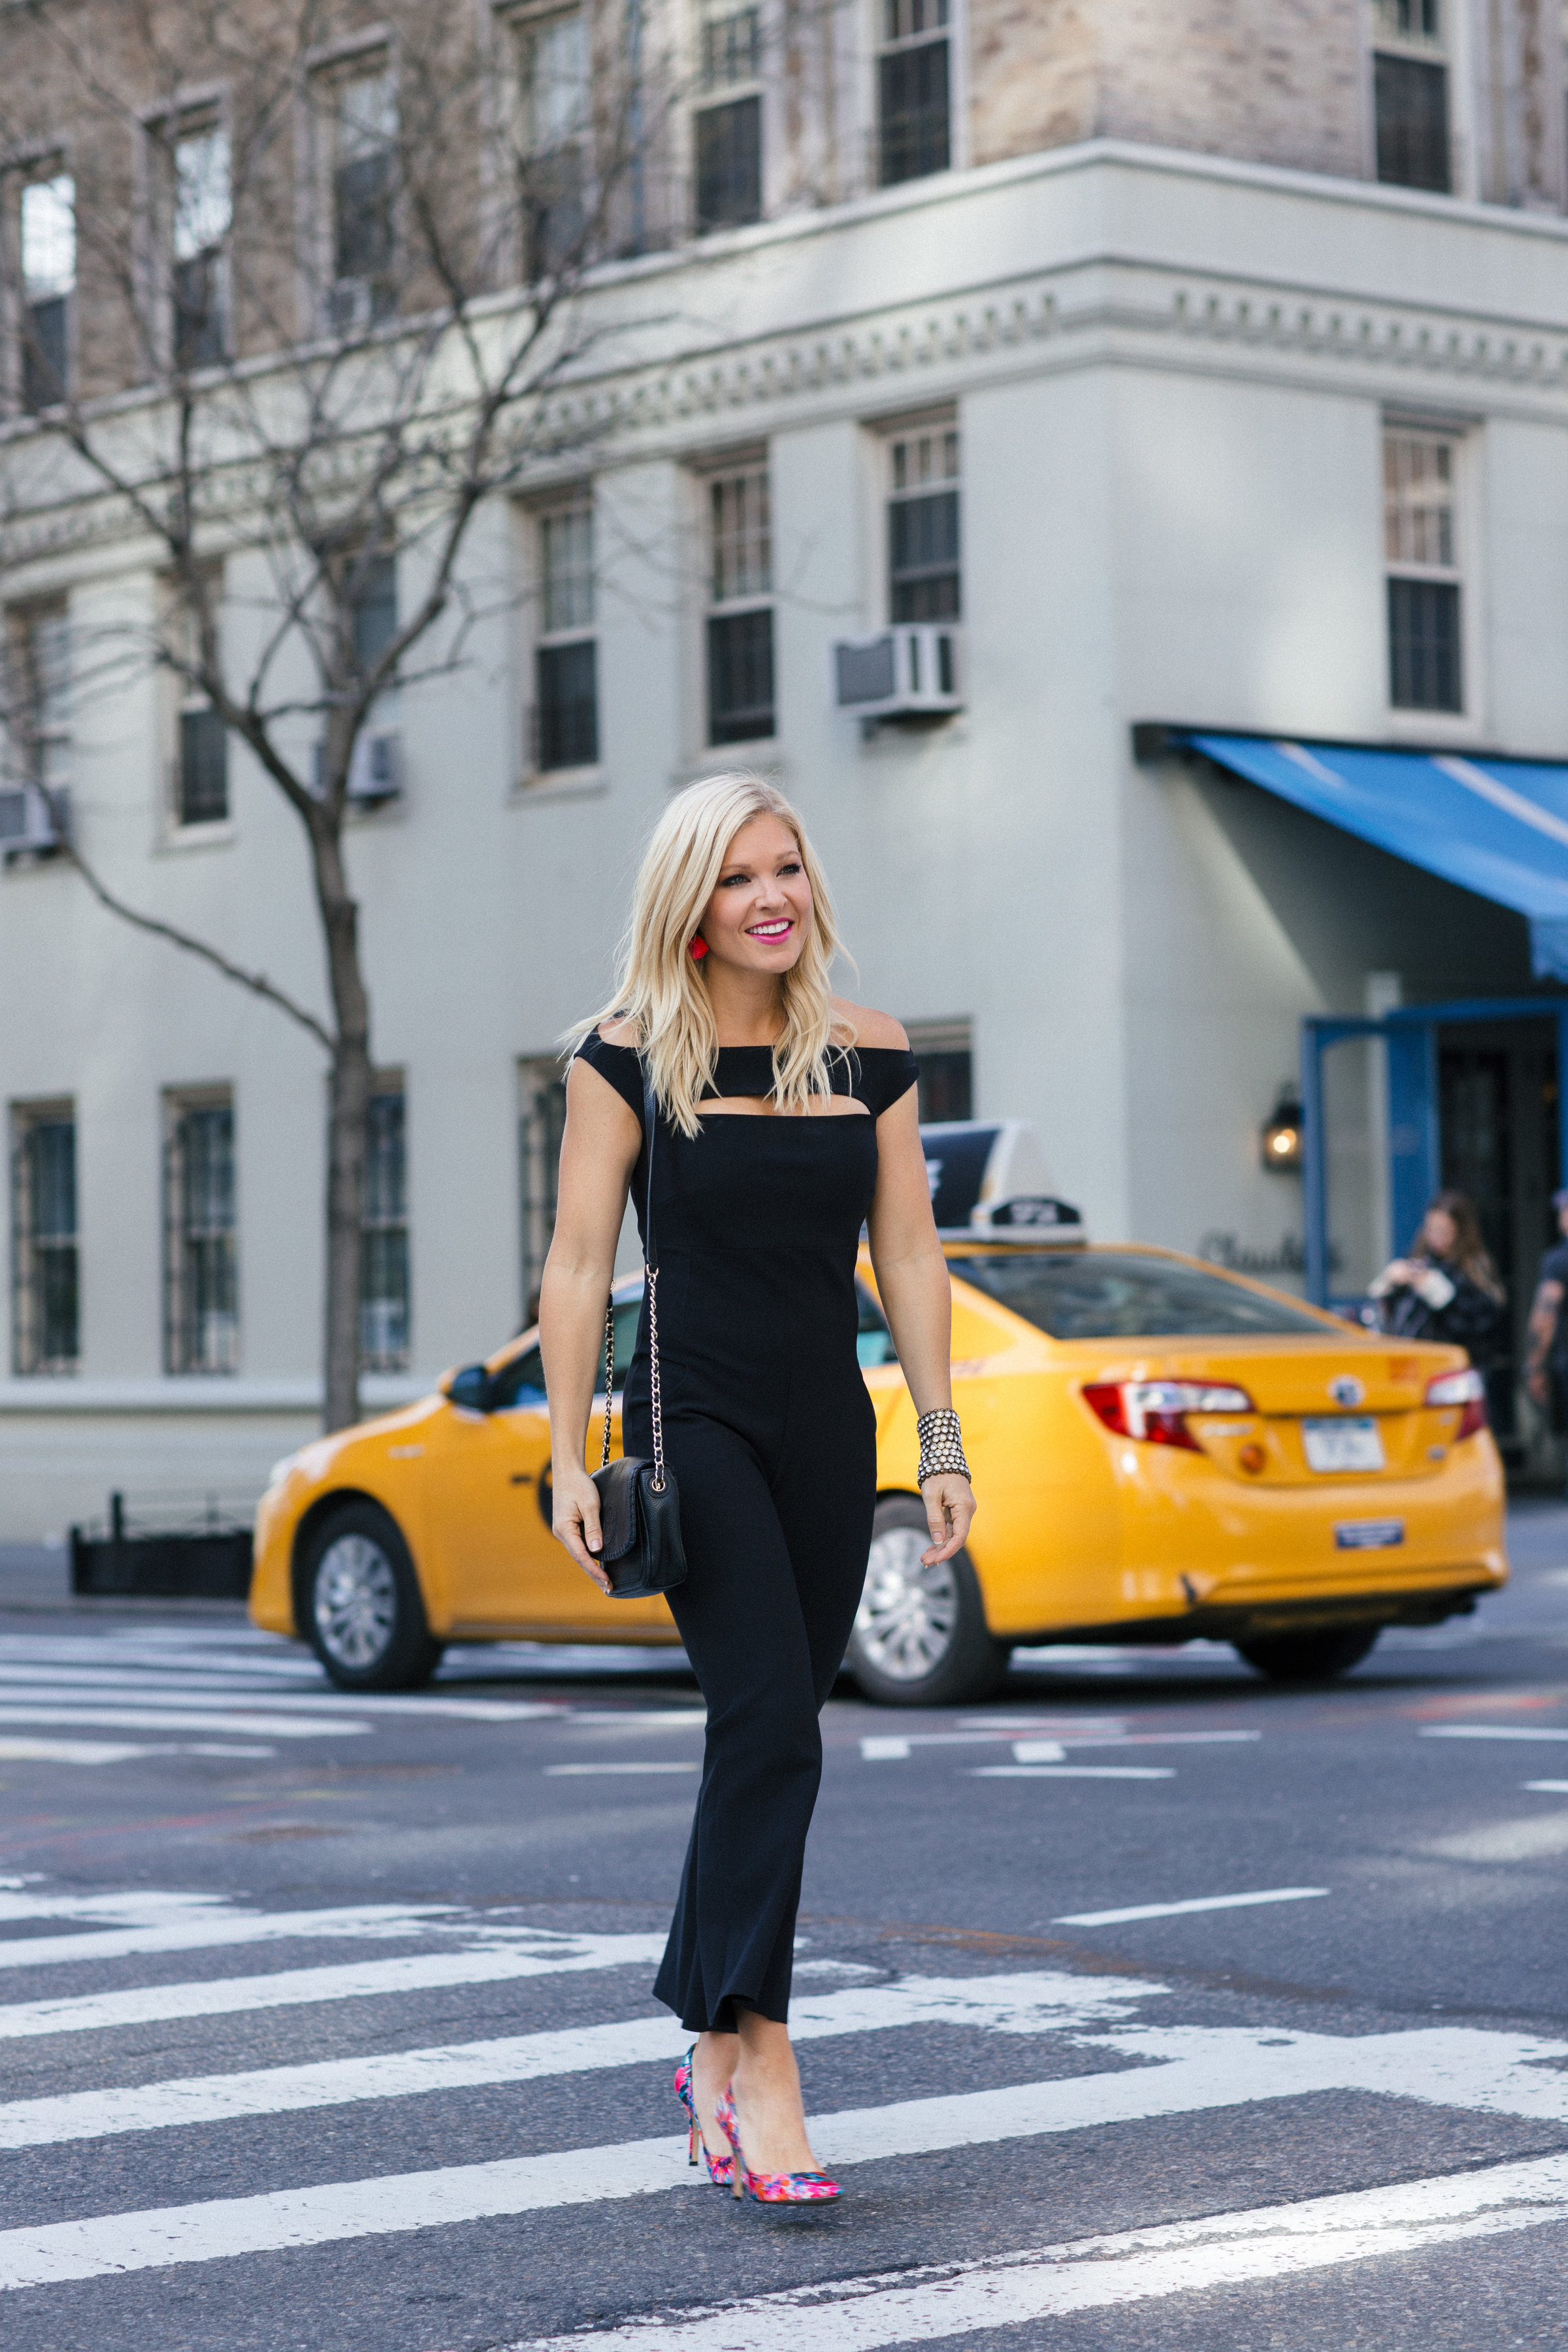 Anna Kooiman New York City Fashion 5th Avenue black jumpsuit la petite robe west village nyc nine west tory burch Lydia Hudgens AnnaKooiman.com